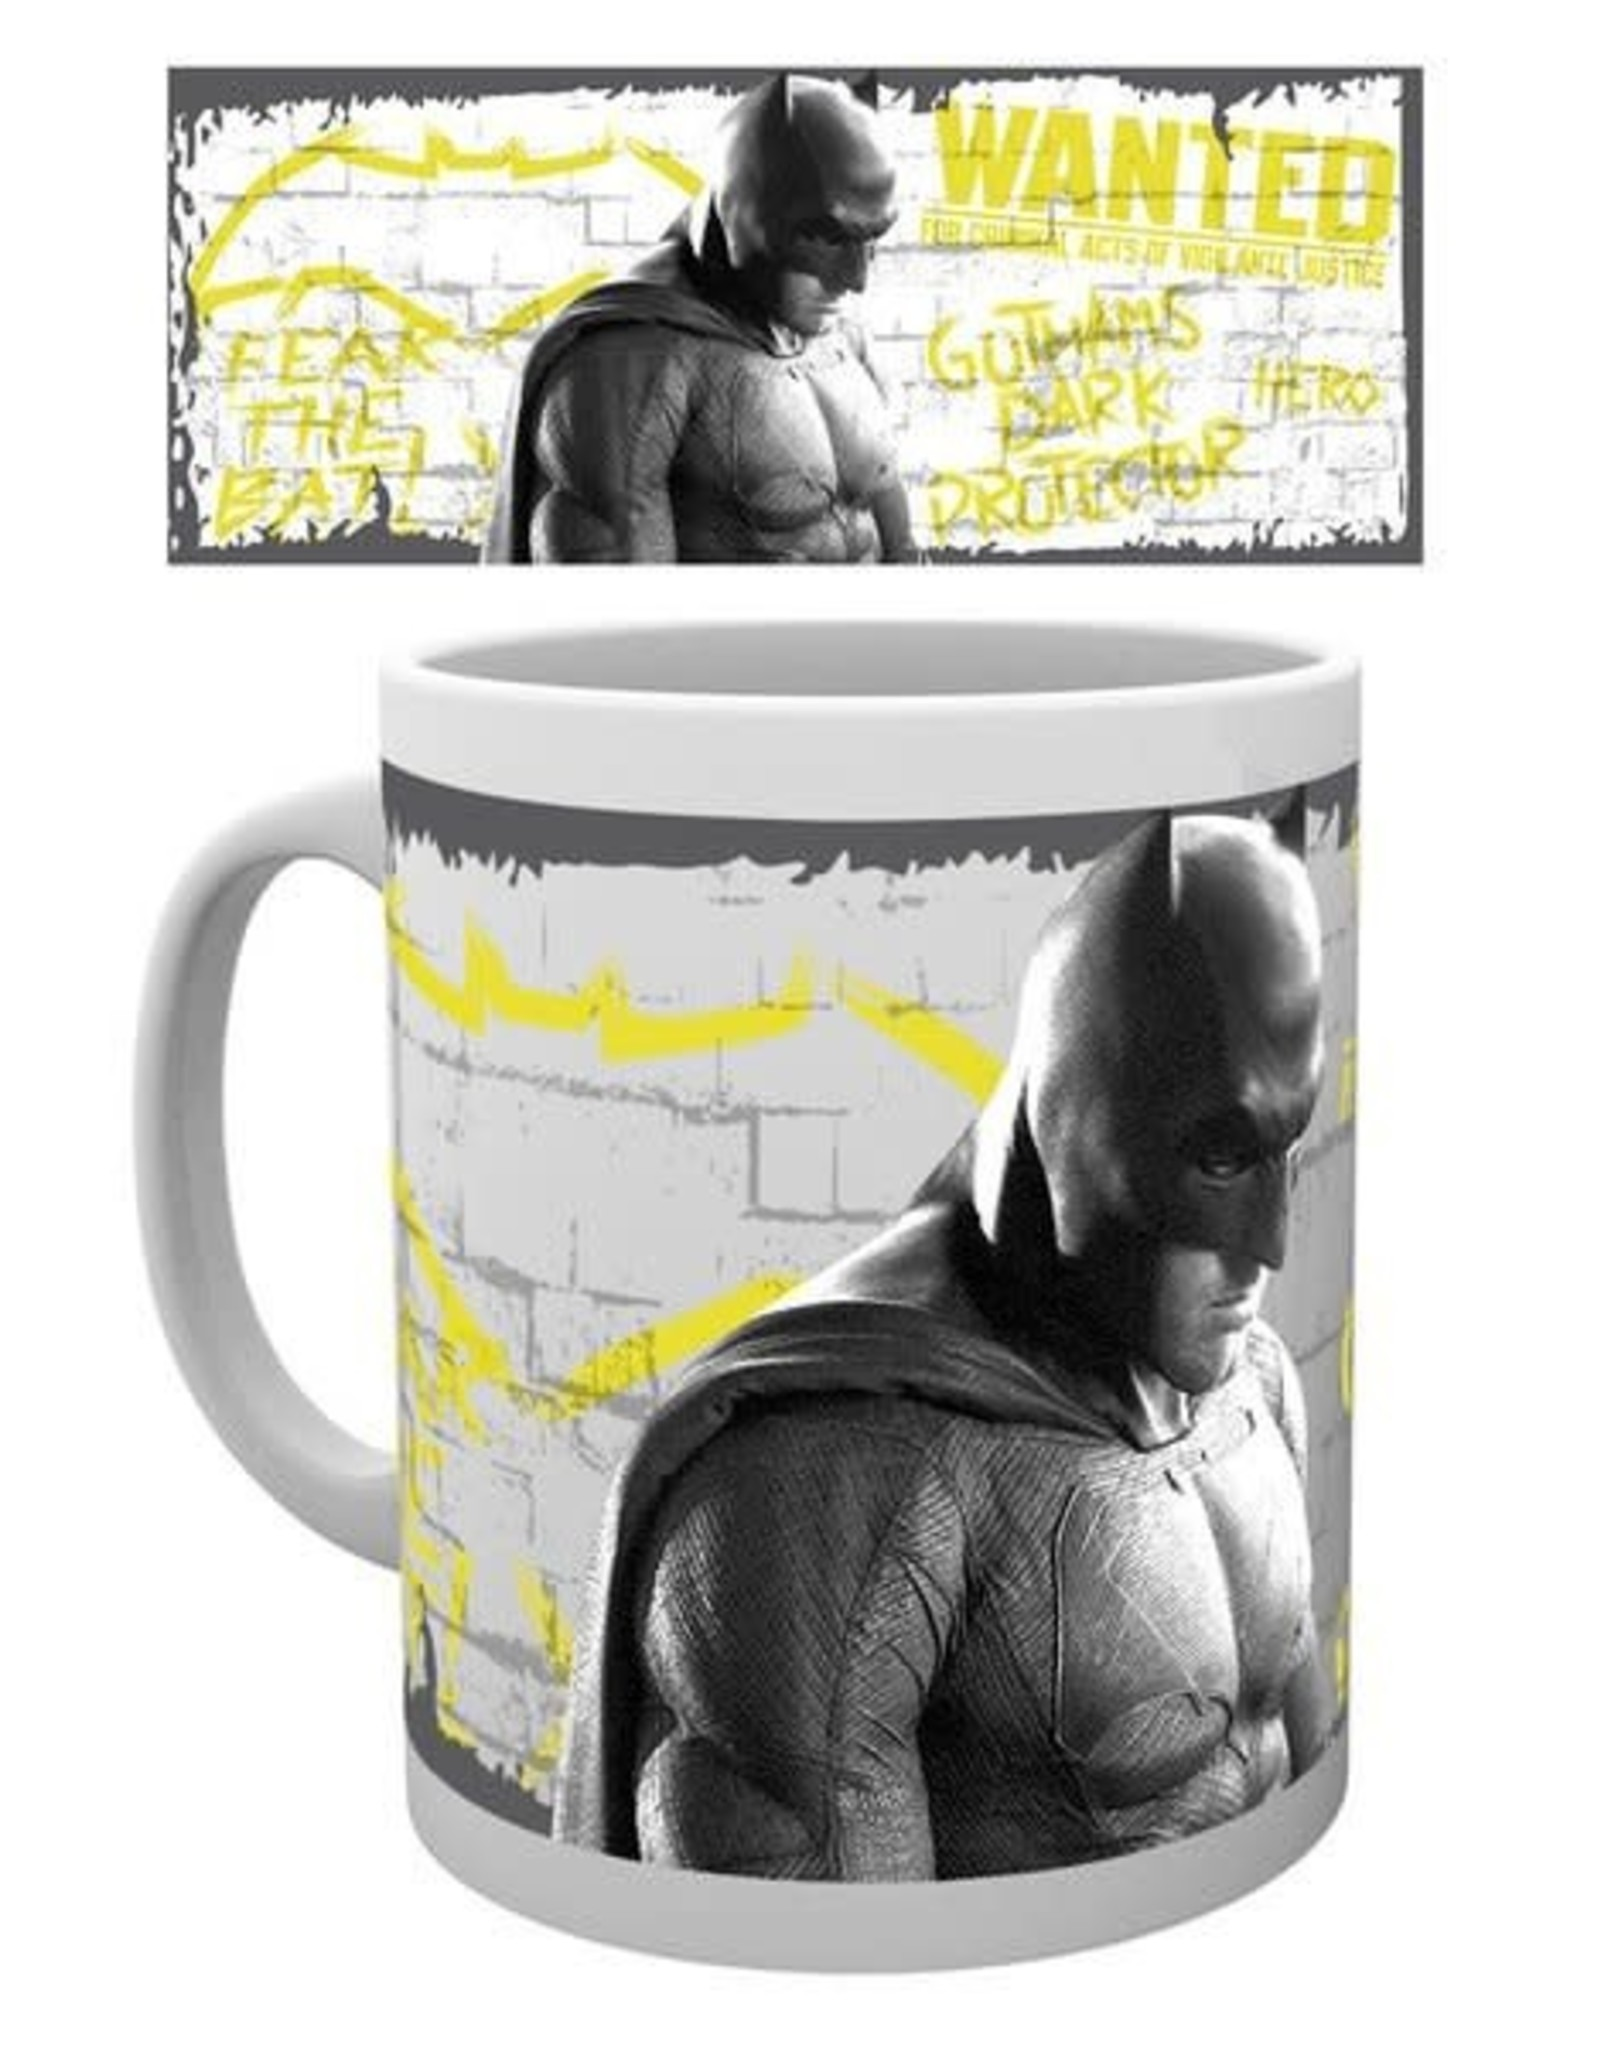 BATMAN VS SUPERMAN - Mug - 300 ml - Wanted